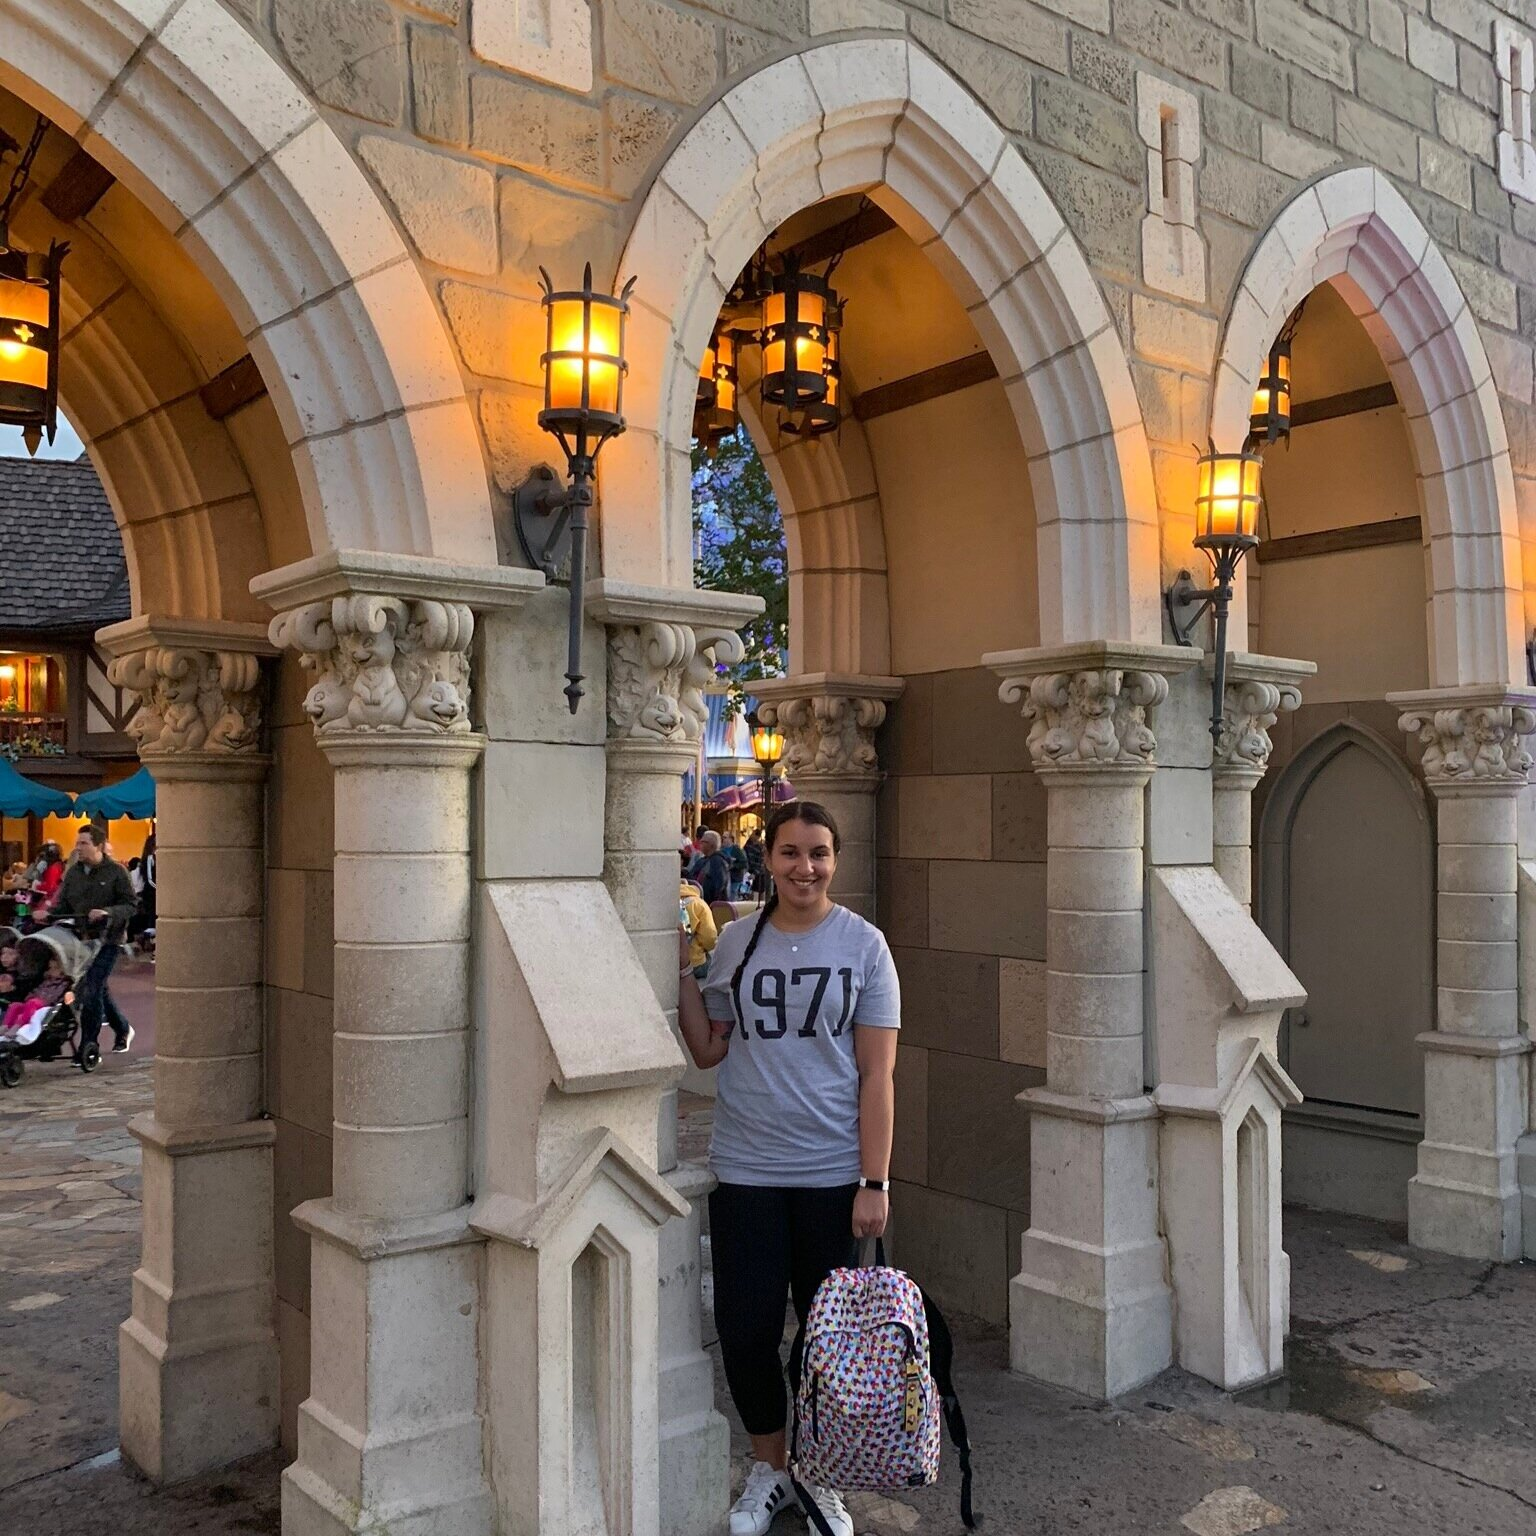 Fantasyland - Tips for Taking the Best Photos at Walt Disney World